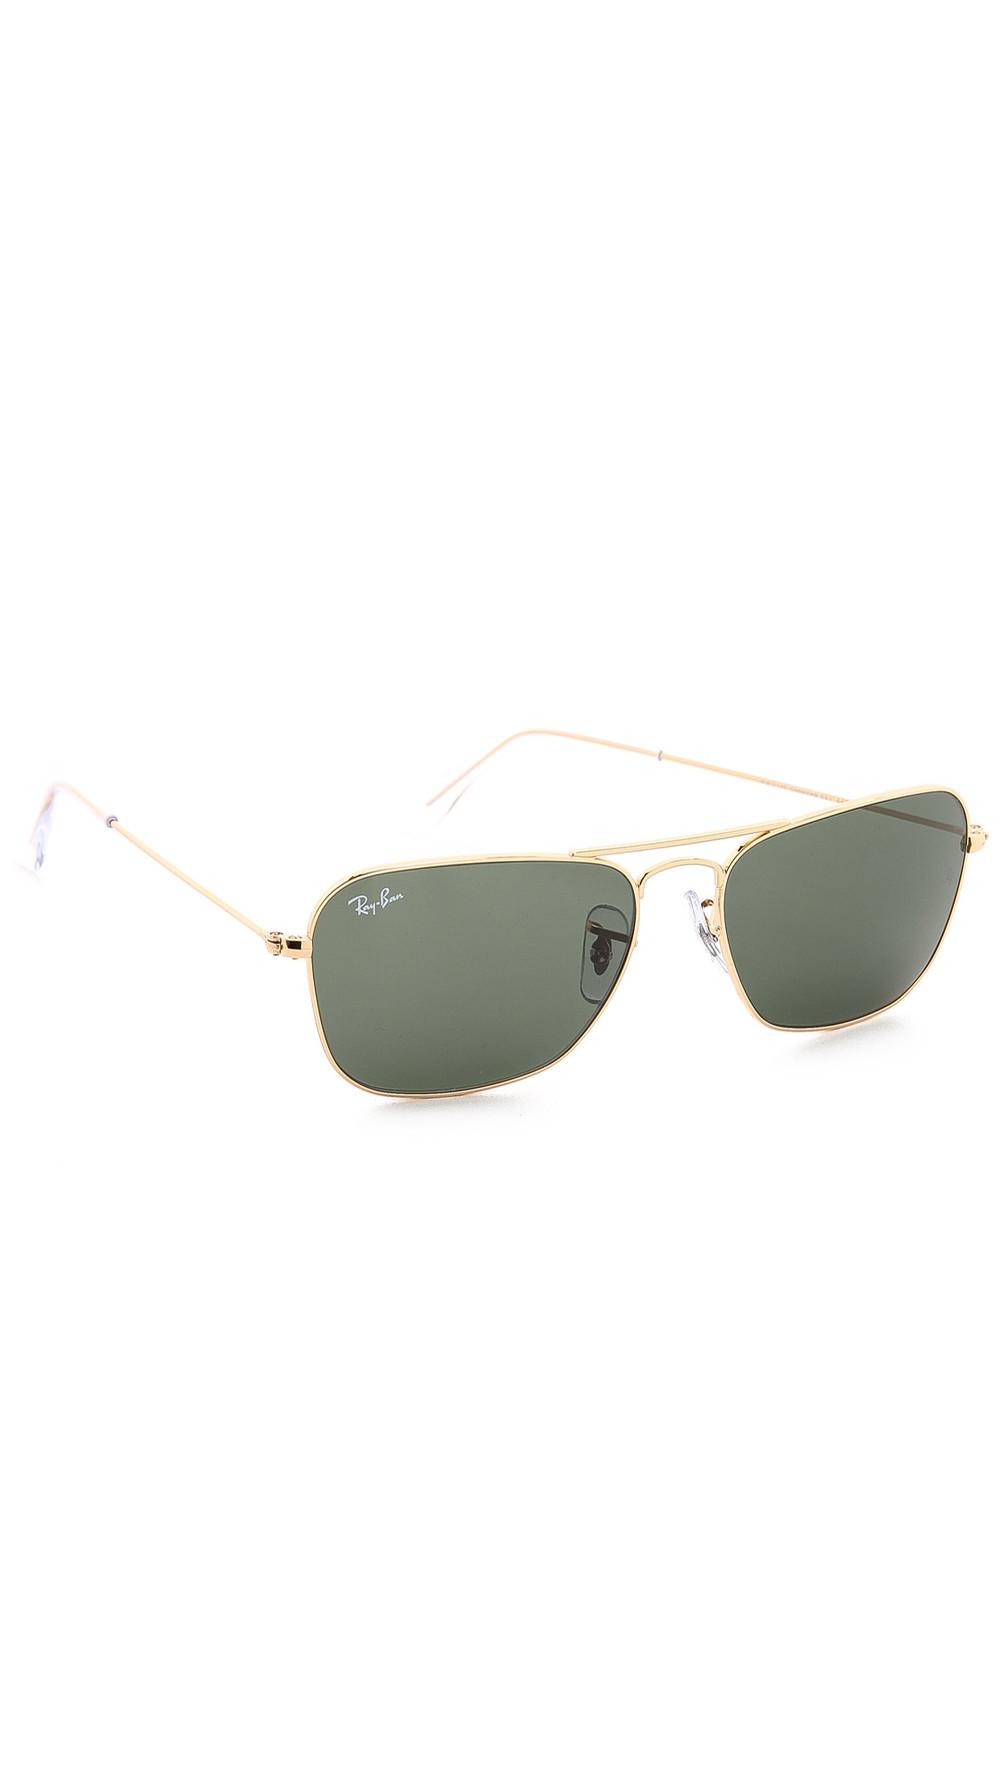 Ray-Ban Caravan Sunglasses in gold / green